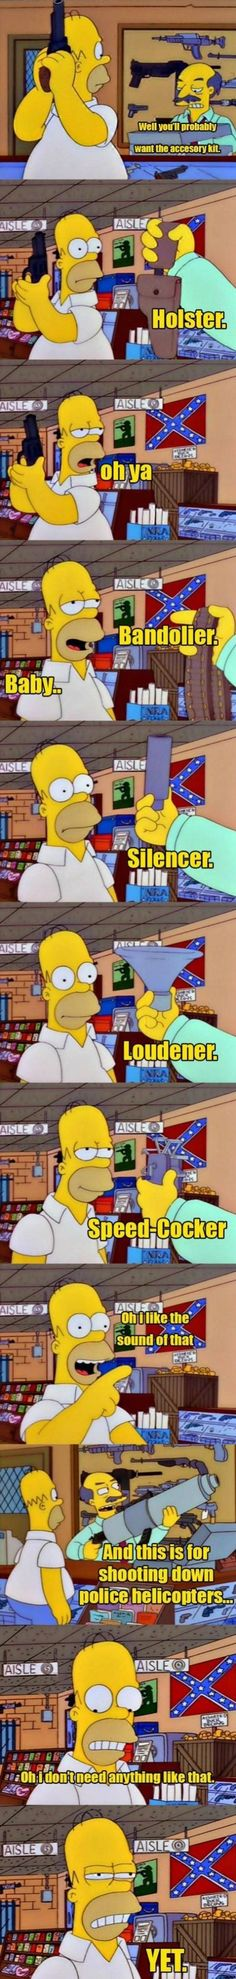 Homer - www.meme-lol.com